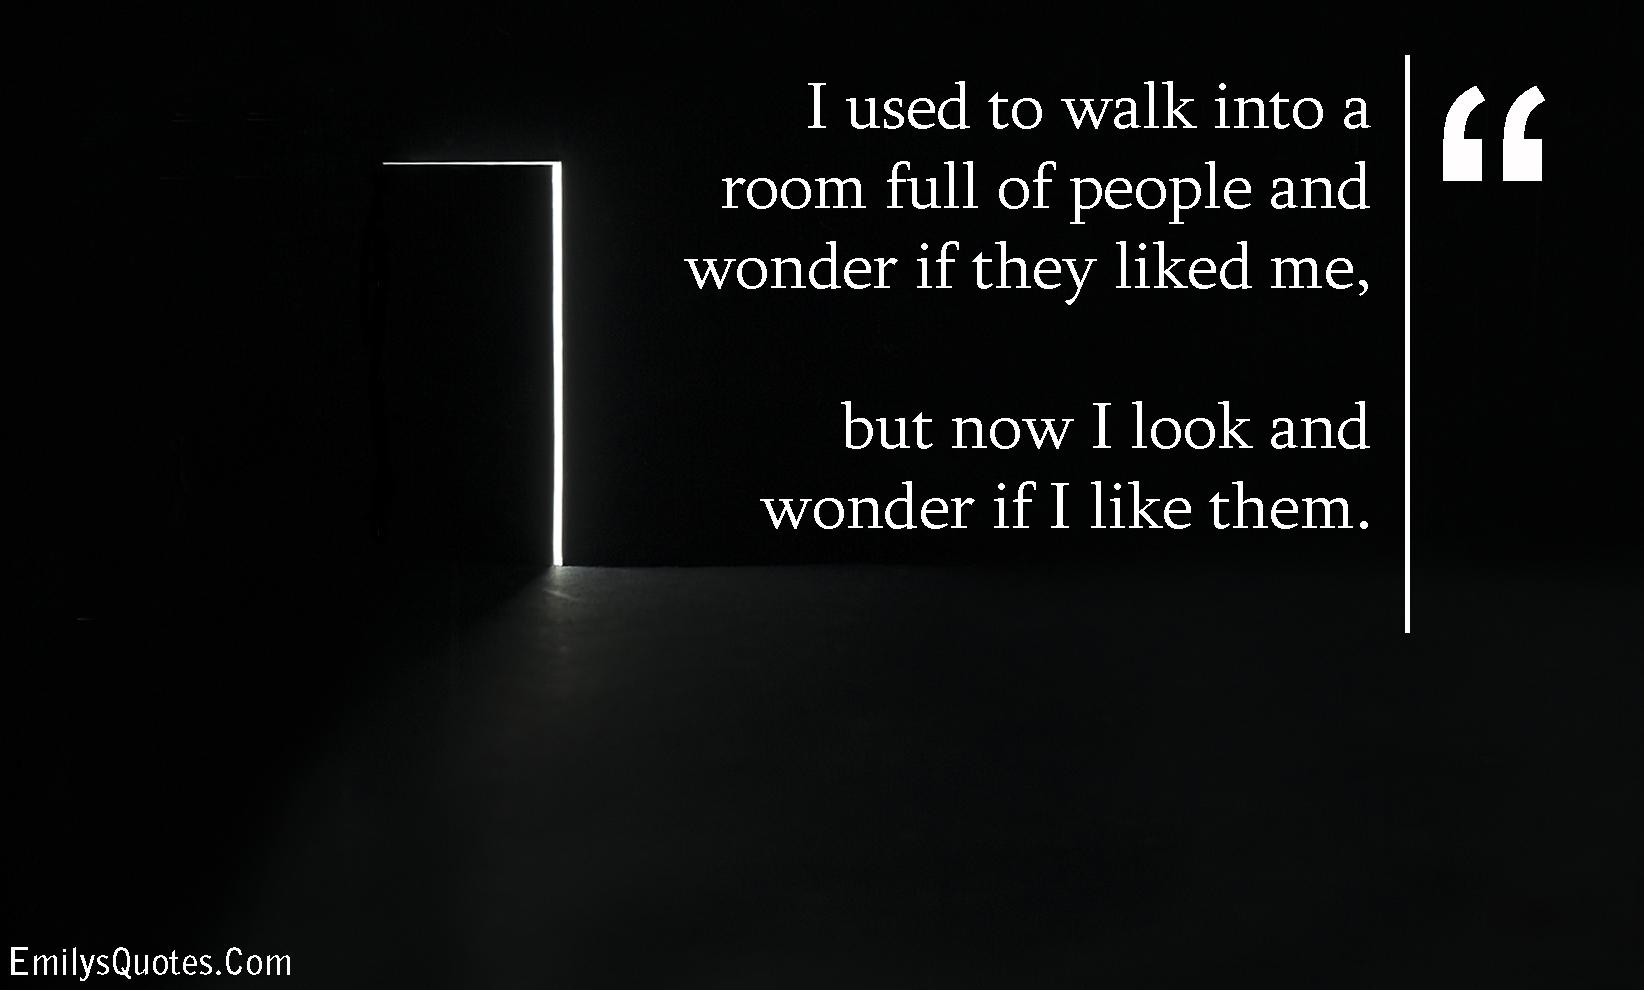 EmilysQuotes.Com - change, relationship, think, wonder, people, unknown